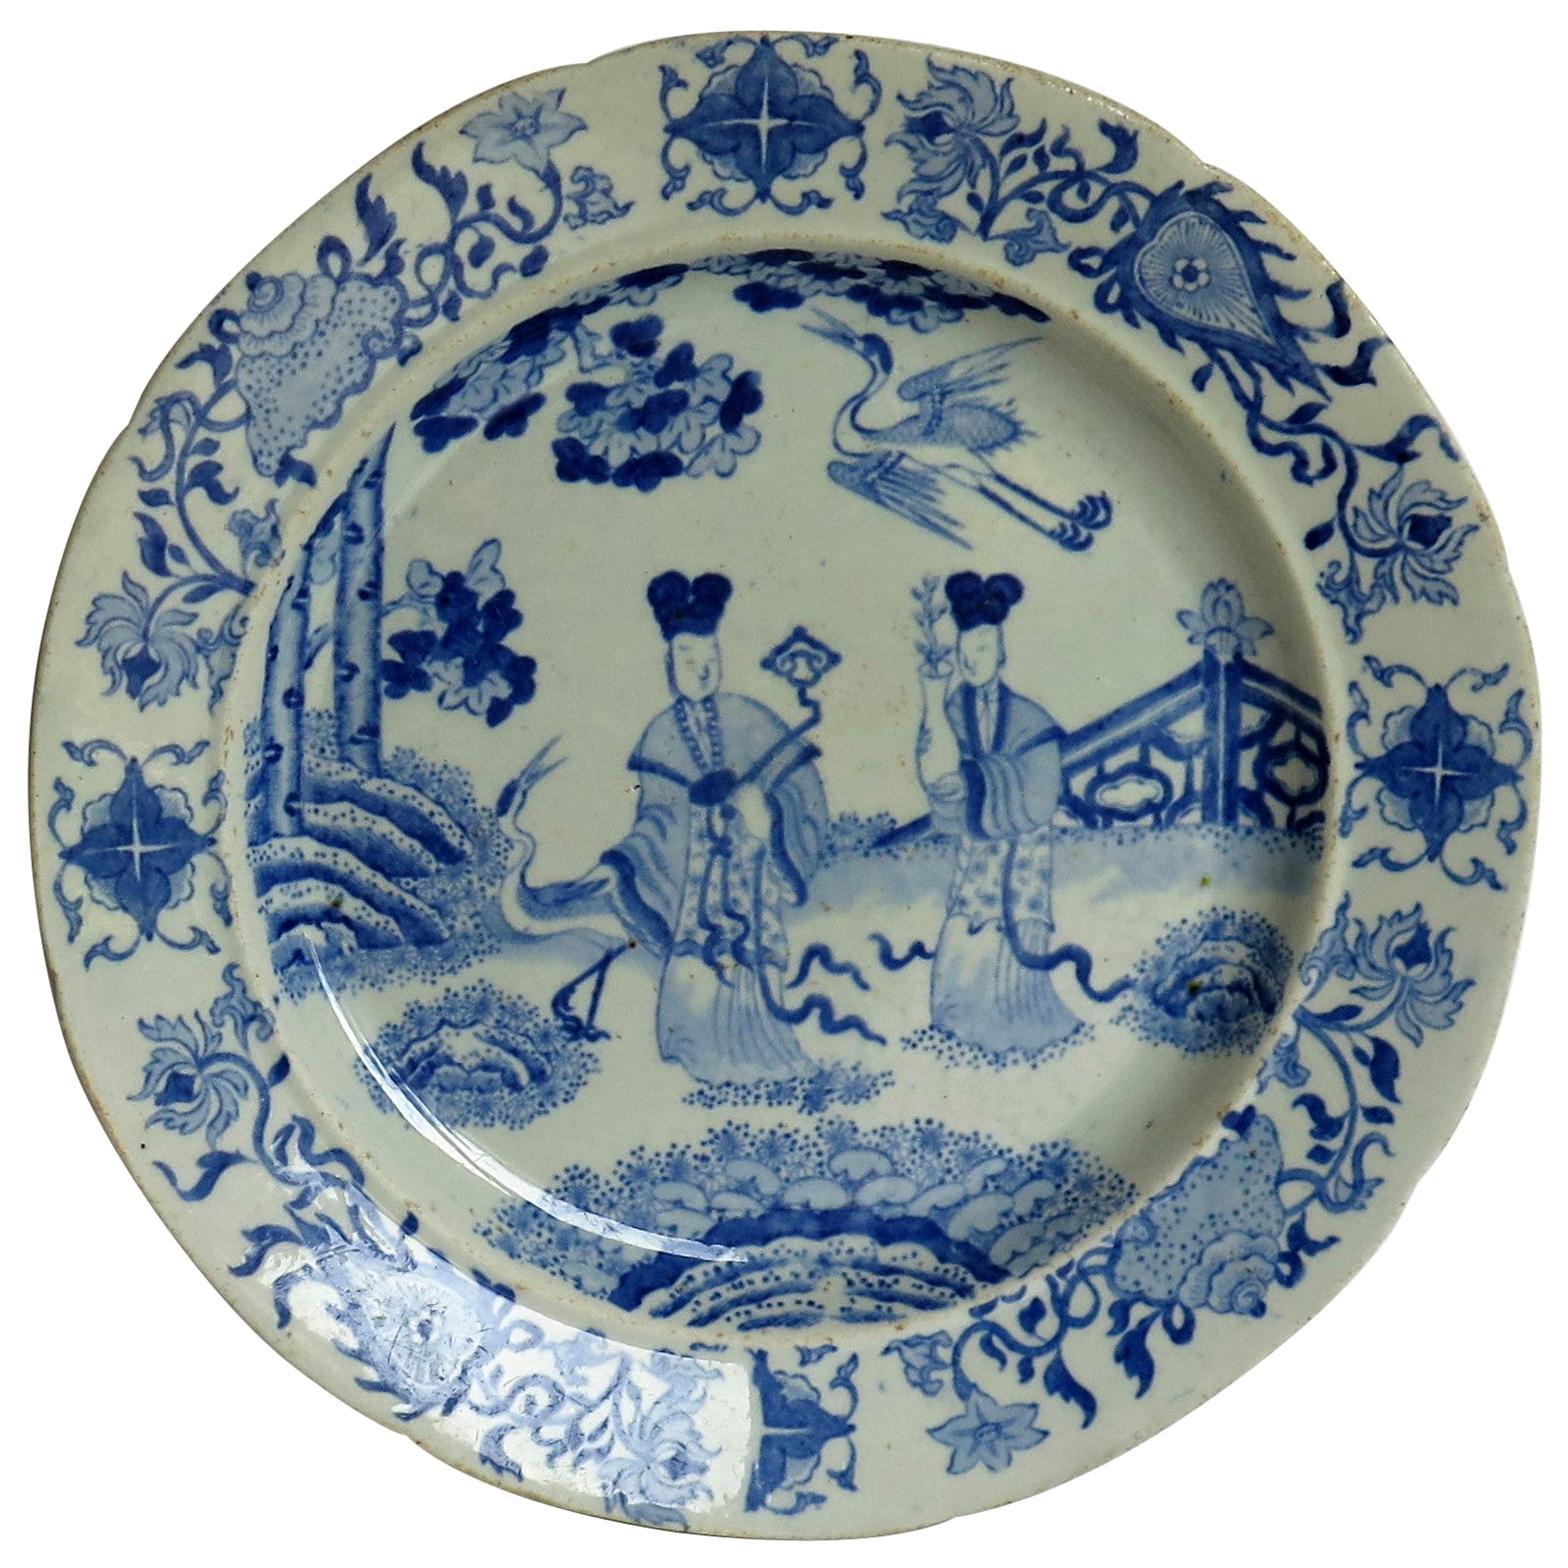 Masons Ironstone Dinner Plate Chinese Ladies with Cranes Rare Pattern circa 1815